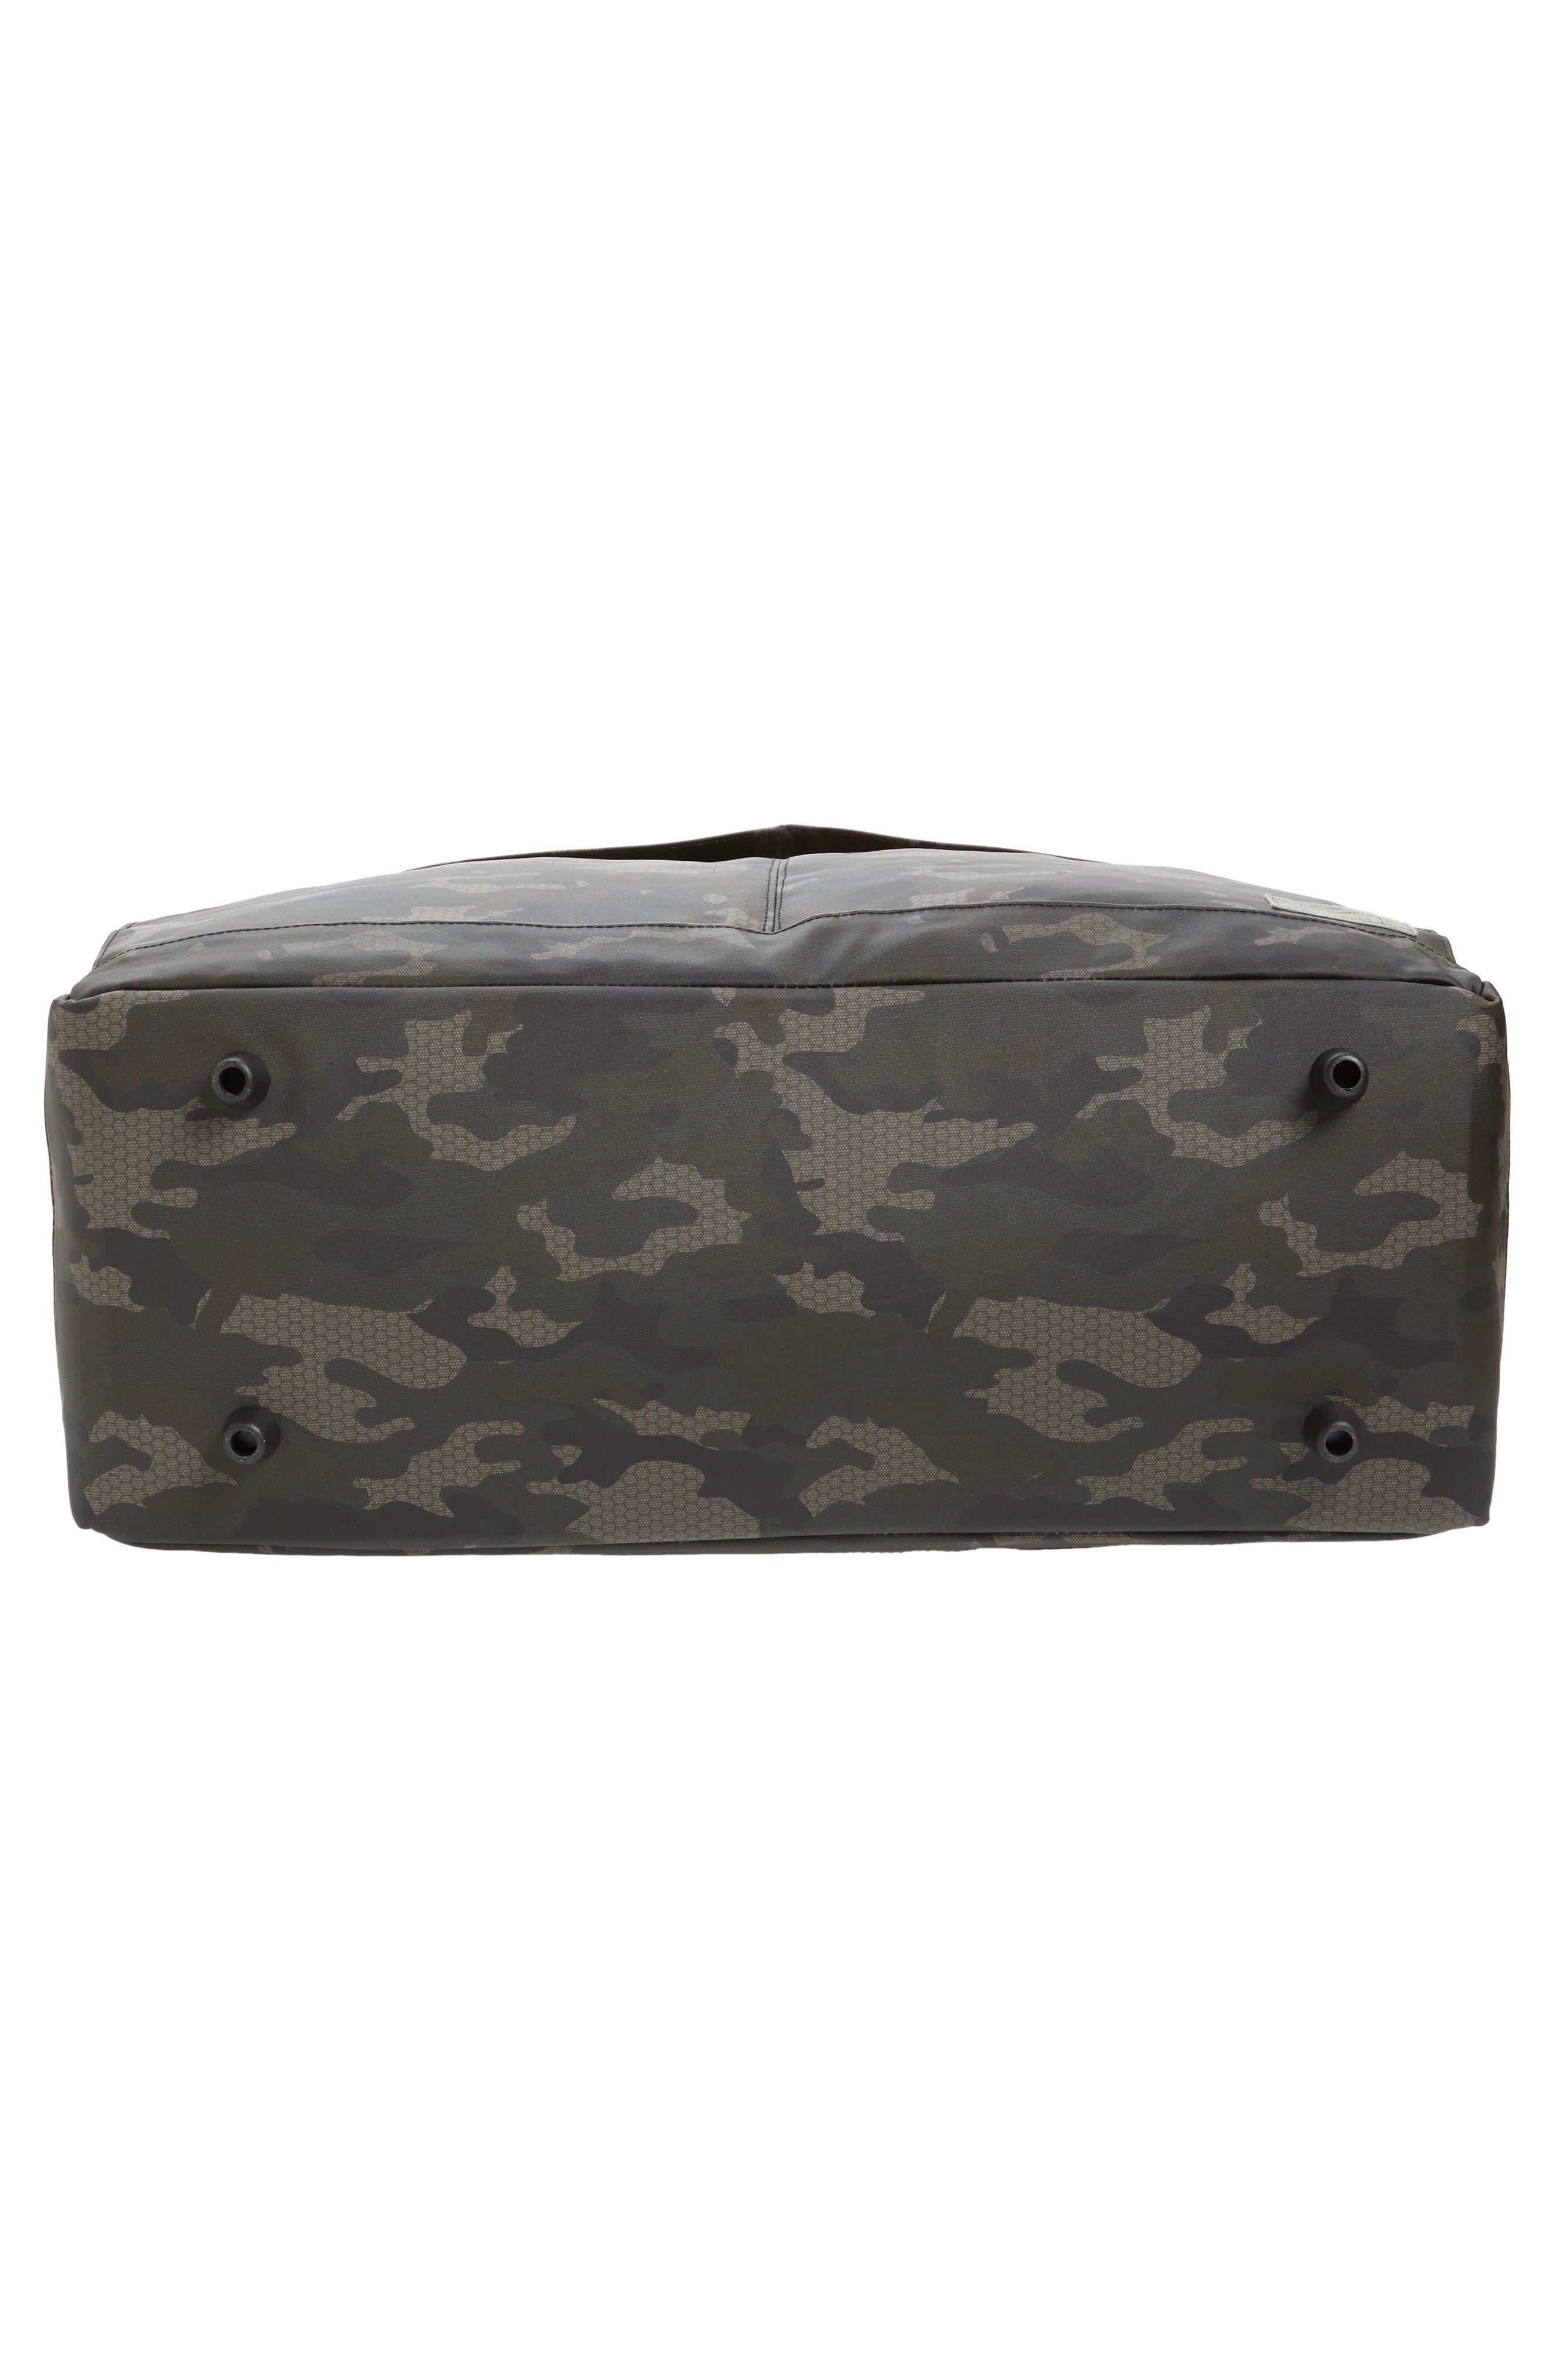 Calibre Duffel Bag,                             Alternate thumbnail 6, color,                             Camo